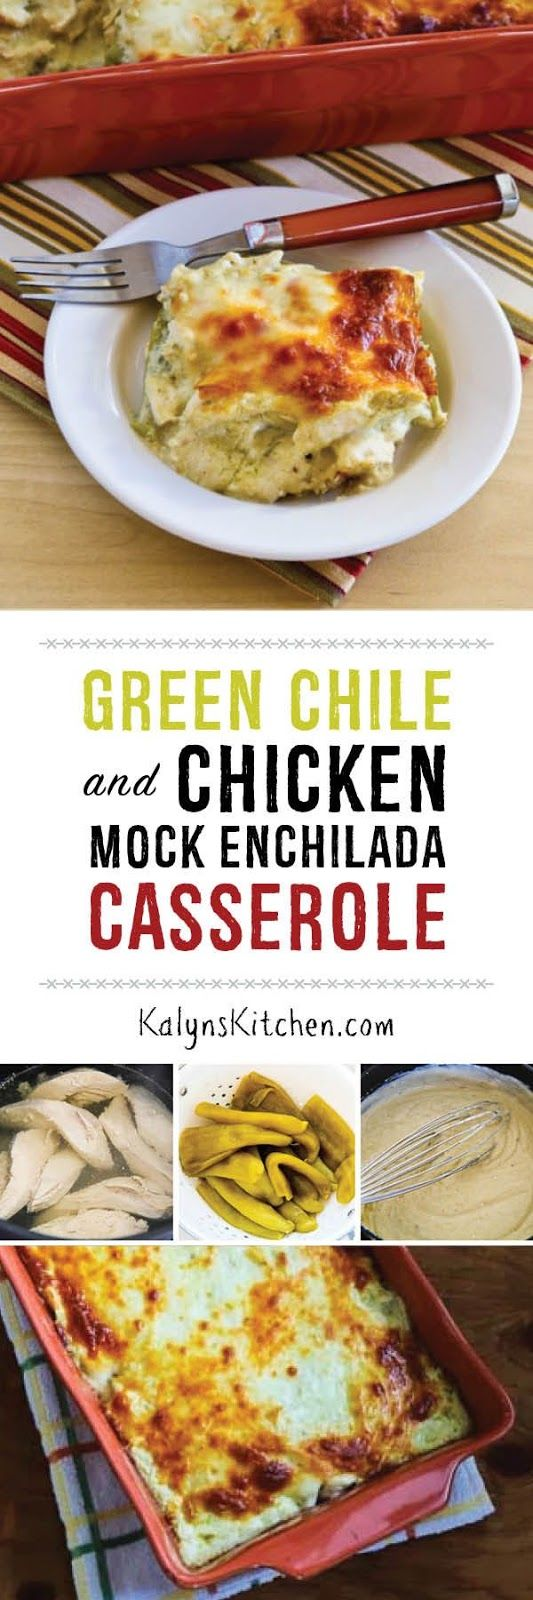 about Casserole Recipes on Pinterest | Casserole recipes, Enchilada ...